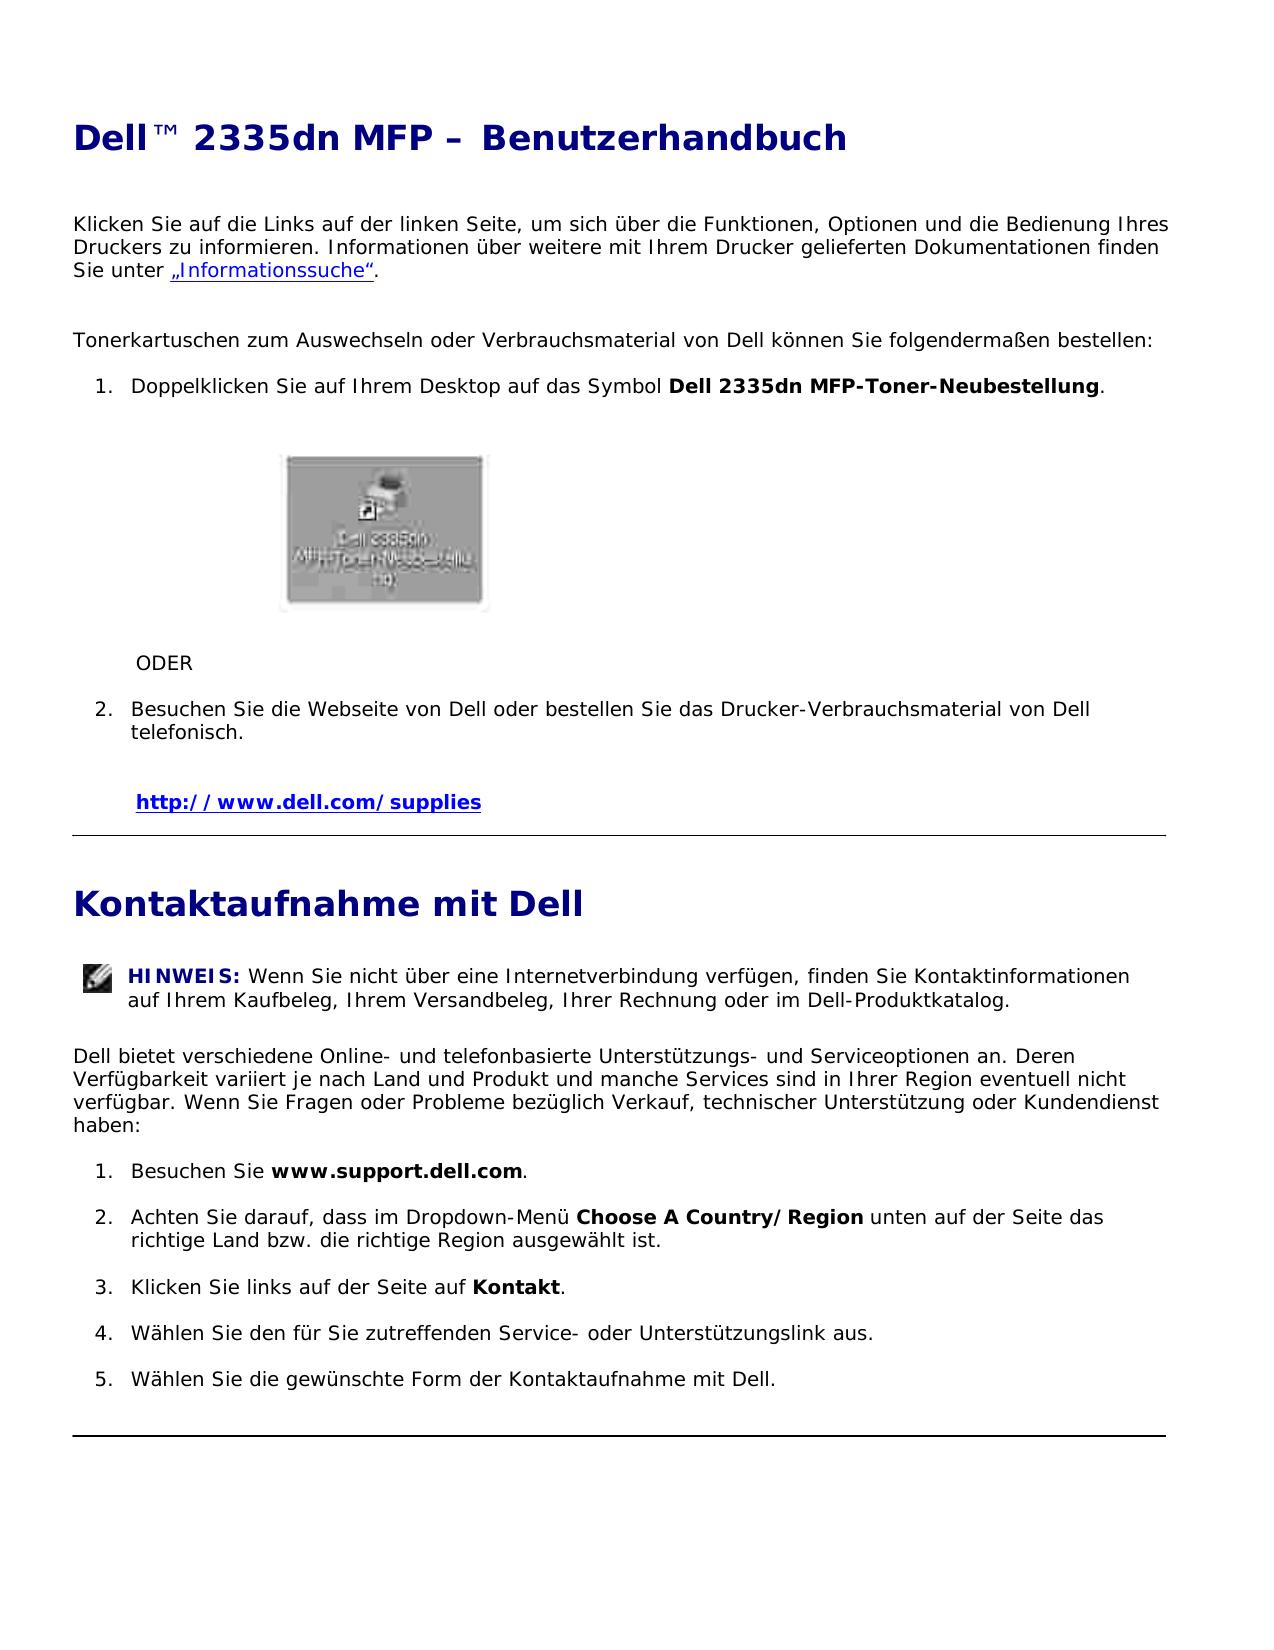 dell Array - dell 2335dn user manual pdf rh dell 2335dn user manual pdf  elzplorers de